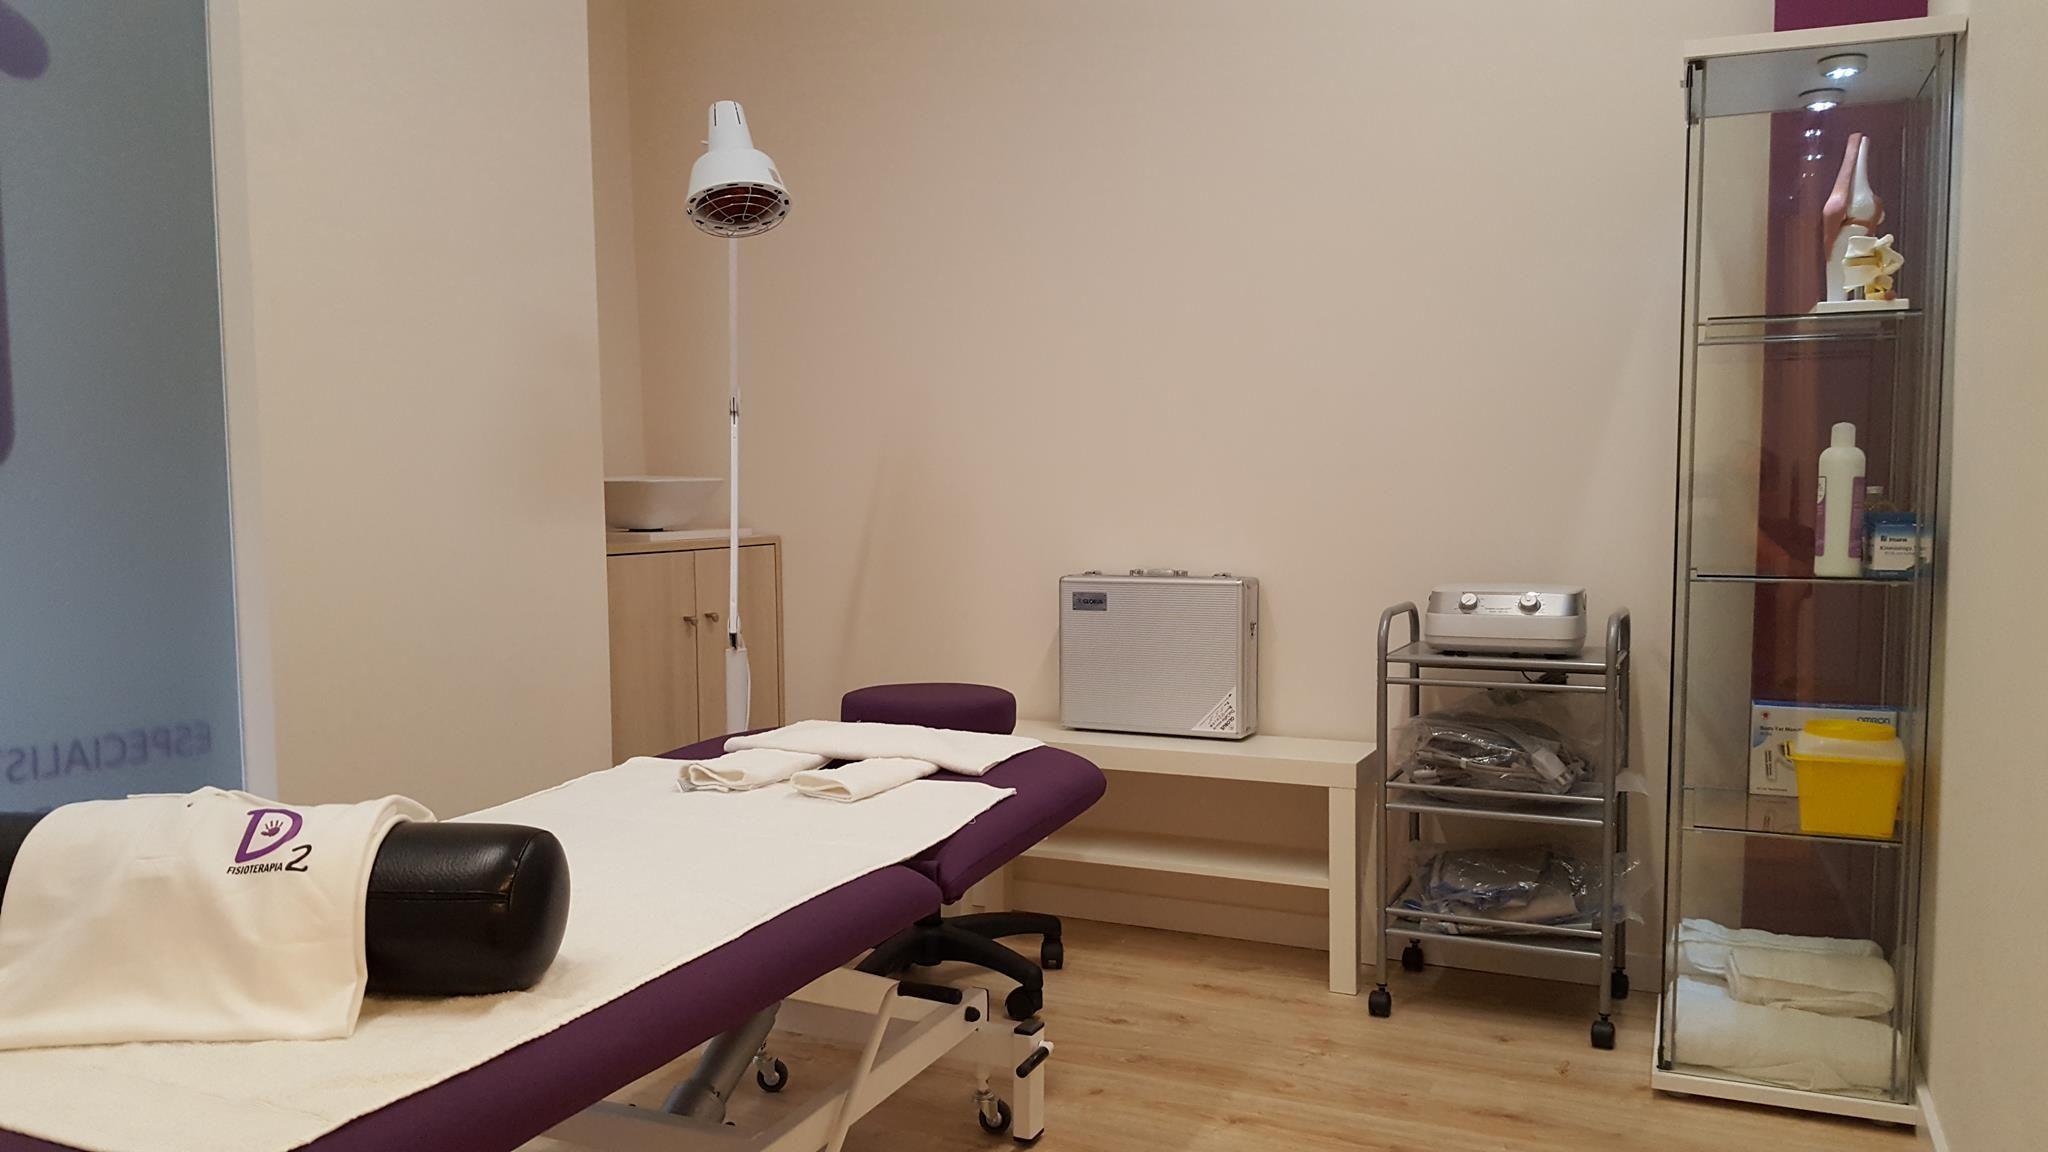 Tu centro de fisioterapia y pilates en La Laguna, Tenerife